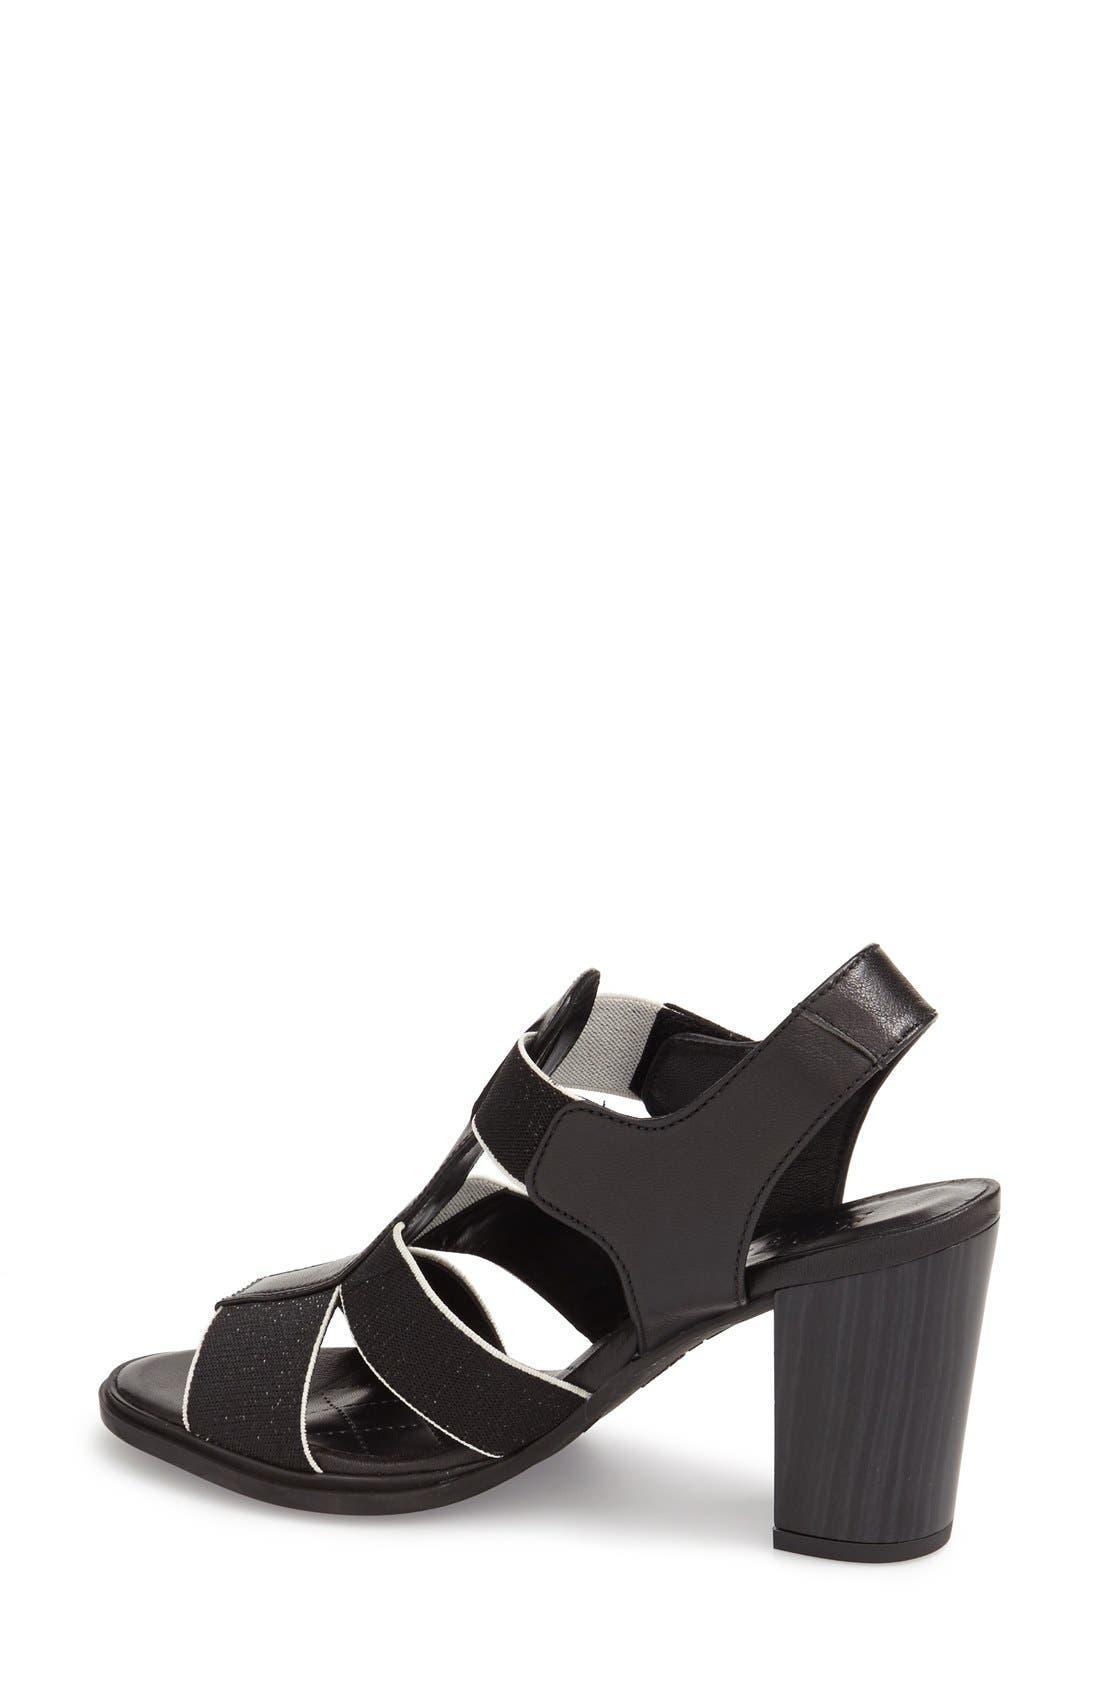 'Matchless' Sandal,                             Alternate thumbnail 2, color,                             Black Leather